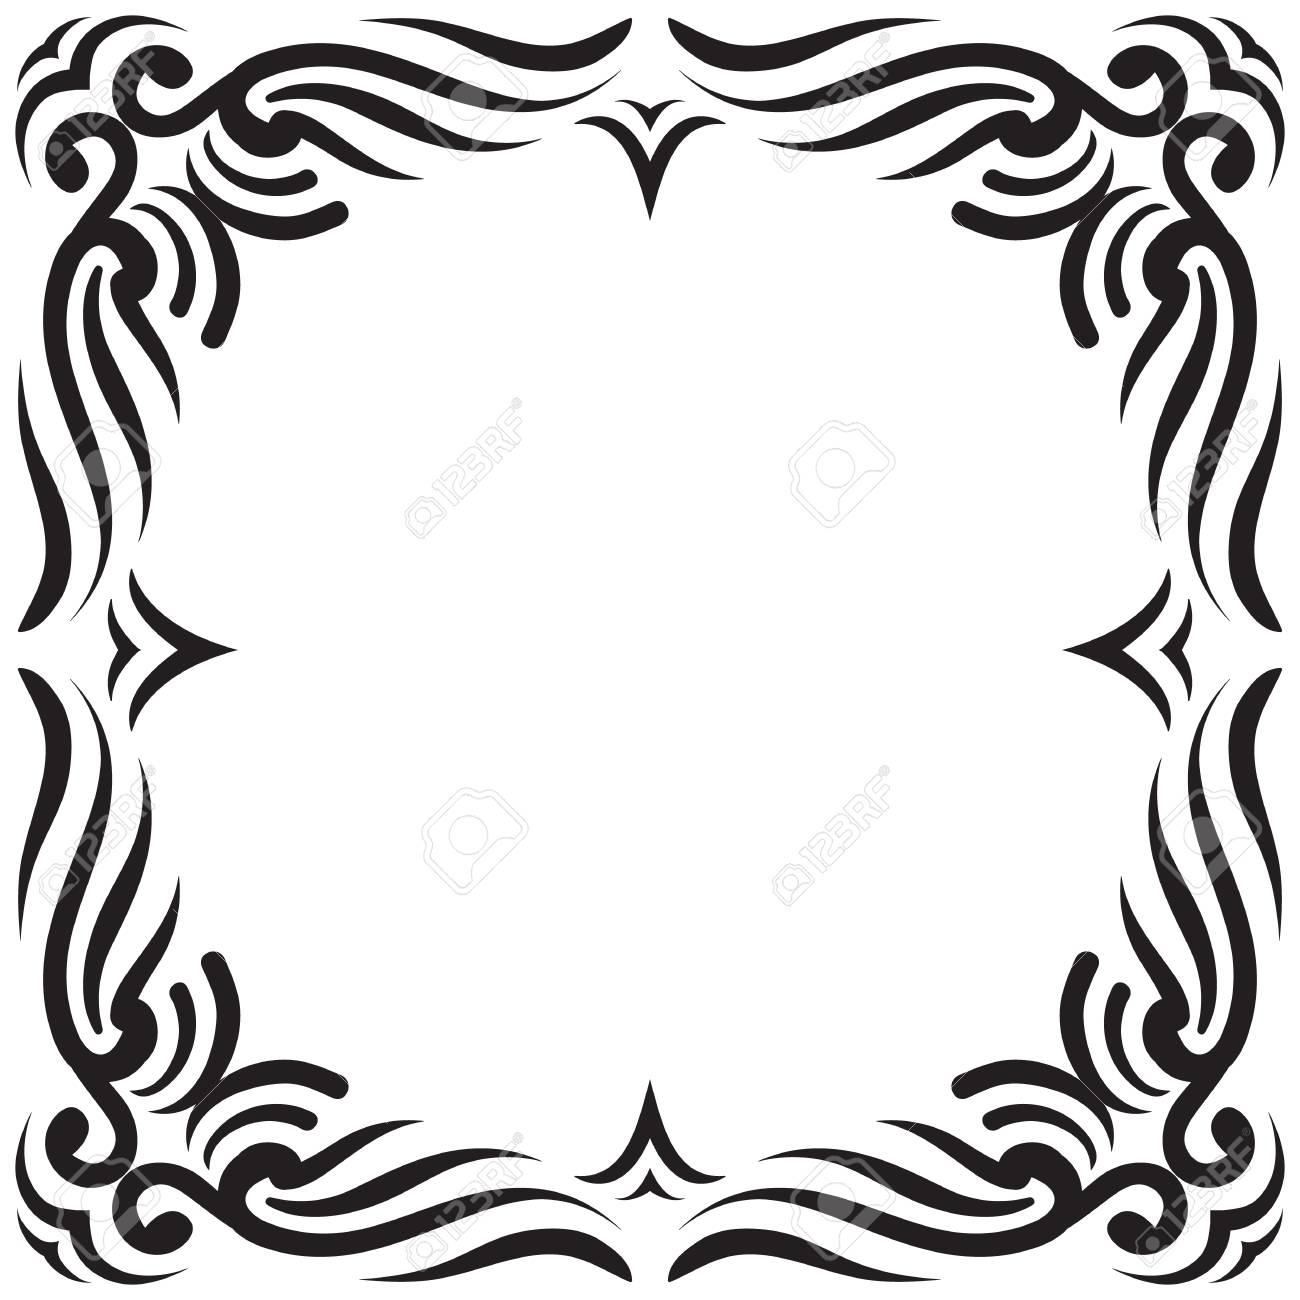 Vector border frame in black color oriental motives vintage vector vector border frame in black color oriental motives vintage filigree can be used for invitation advertisement tattoo design etc stopboris Choice Image